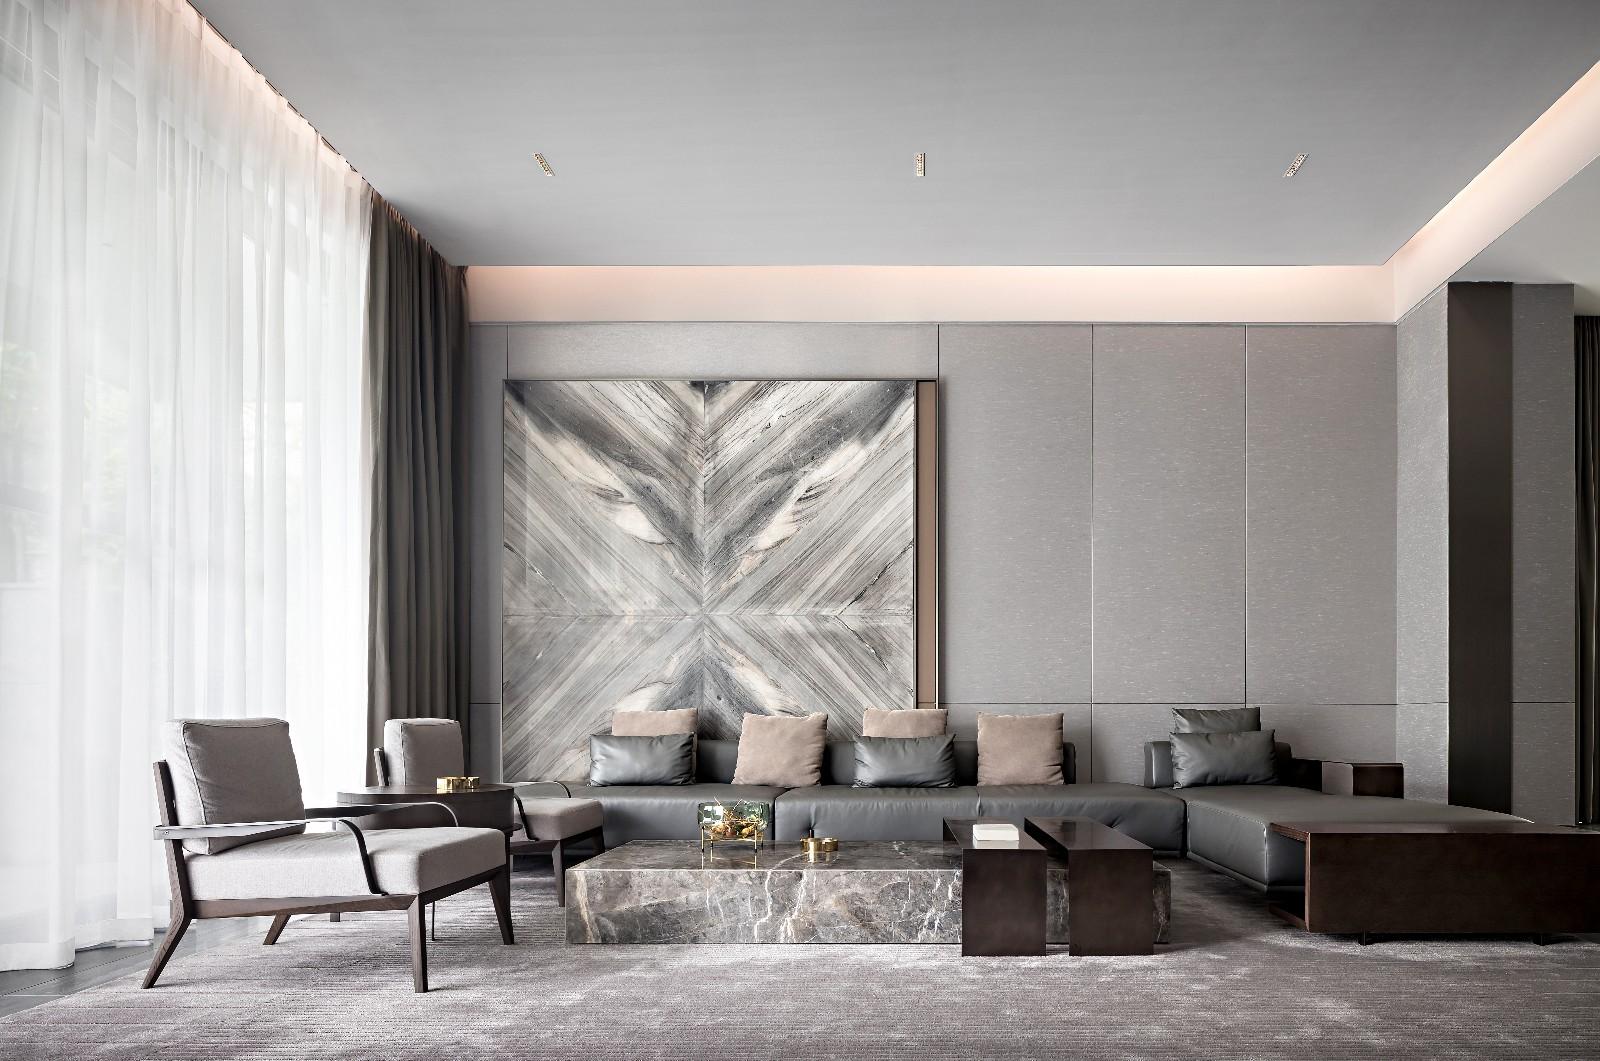 HTD环廷设计 莫兰迪色演绎现代奢华空间/汕头室内设计/汕头设计师/揭